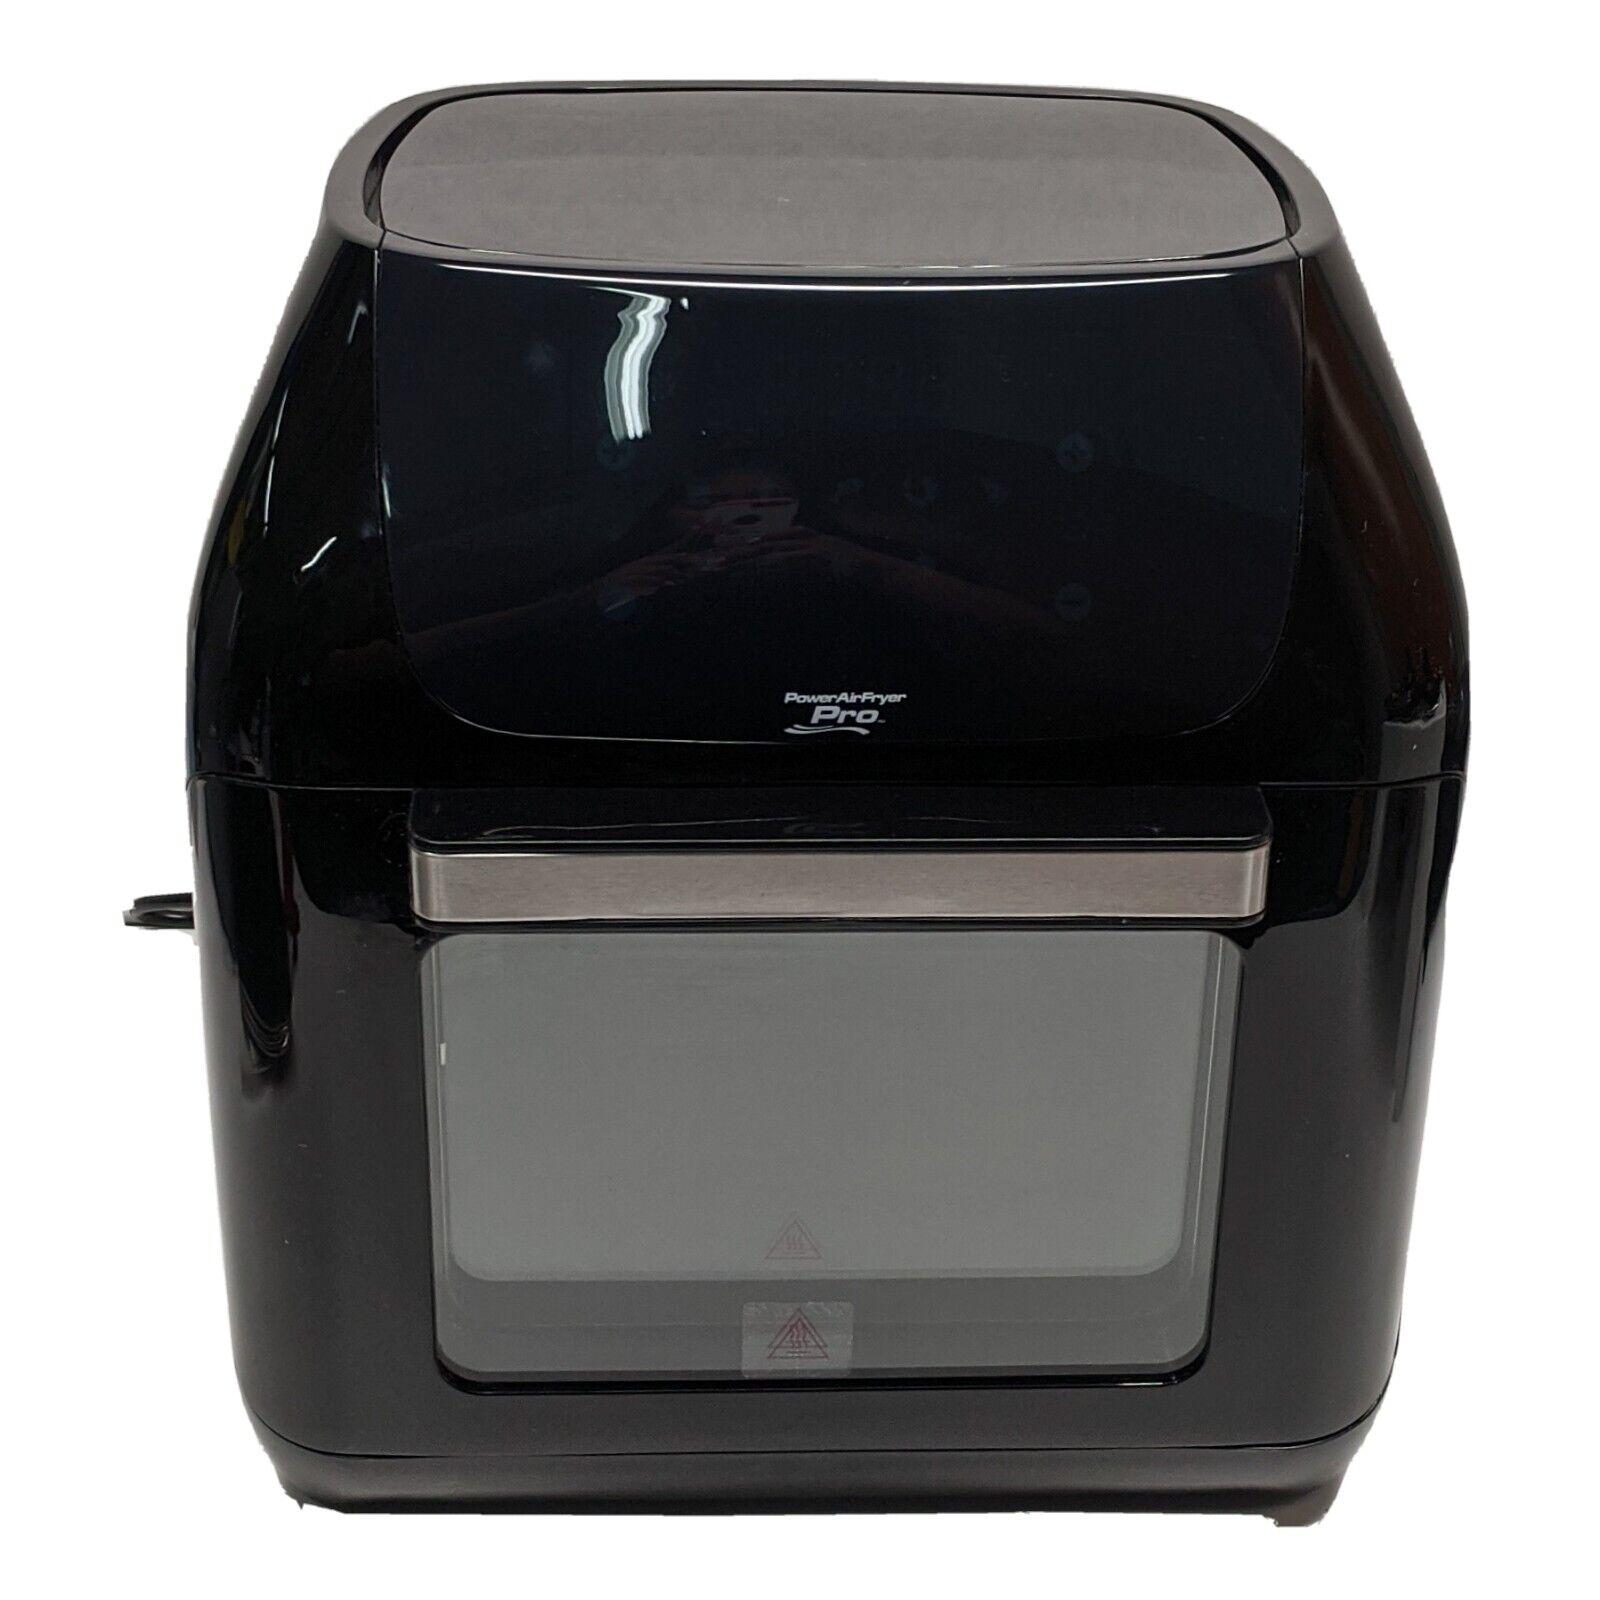 Power Air Fryer Oven 6qt 10 Skewers And Skewers Racks Set For Sale